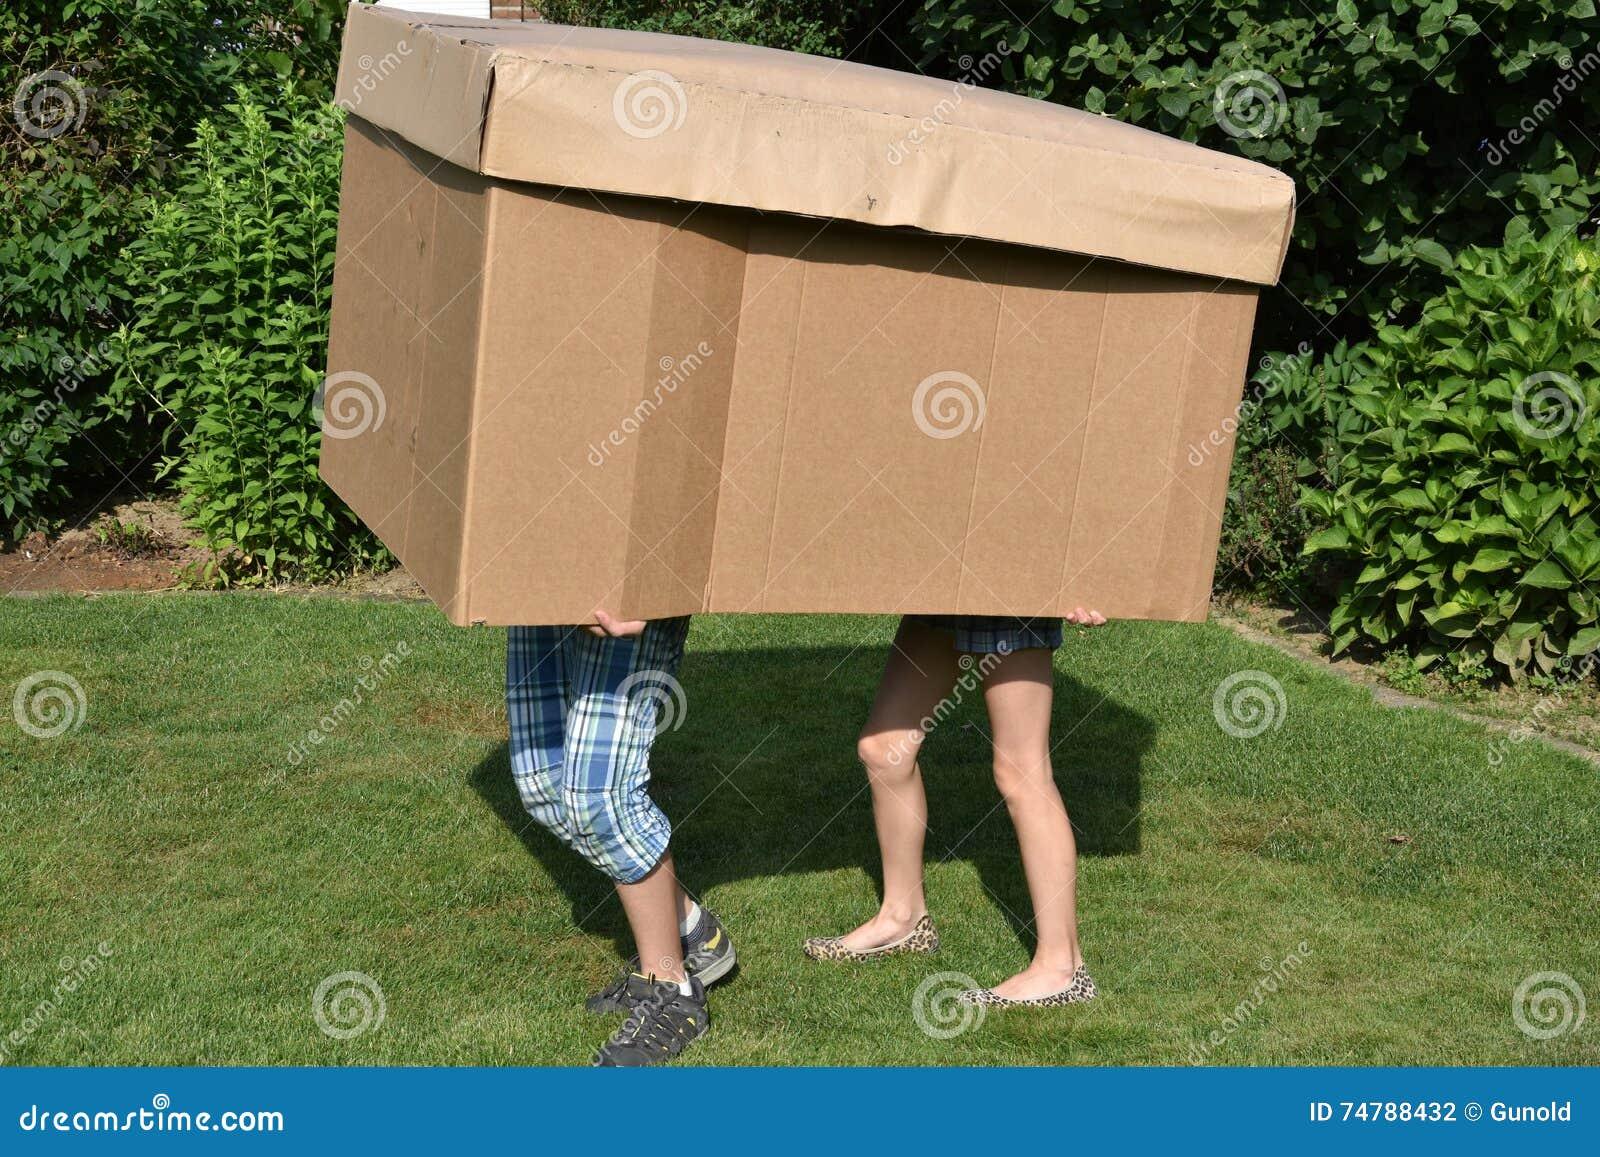 Siblings with cardboard box